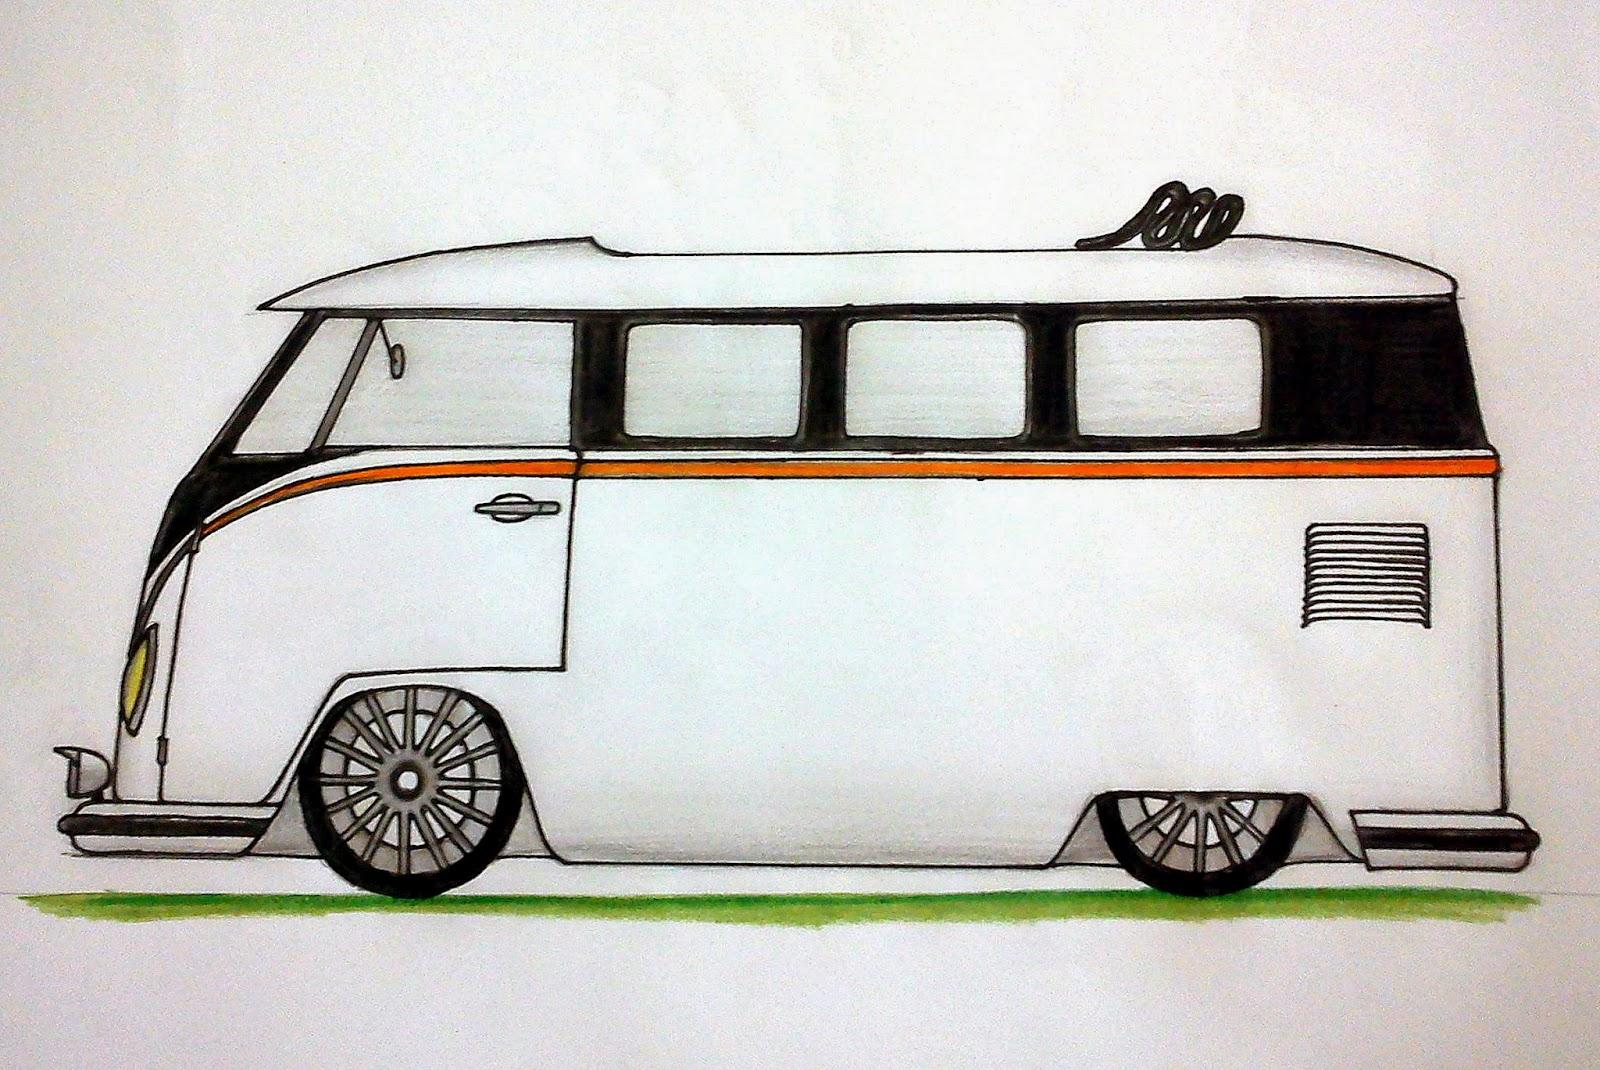 Ismael Desenhos Volkswagen Kombi Se Aposentando